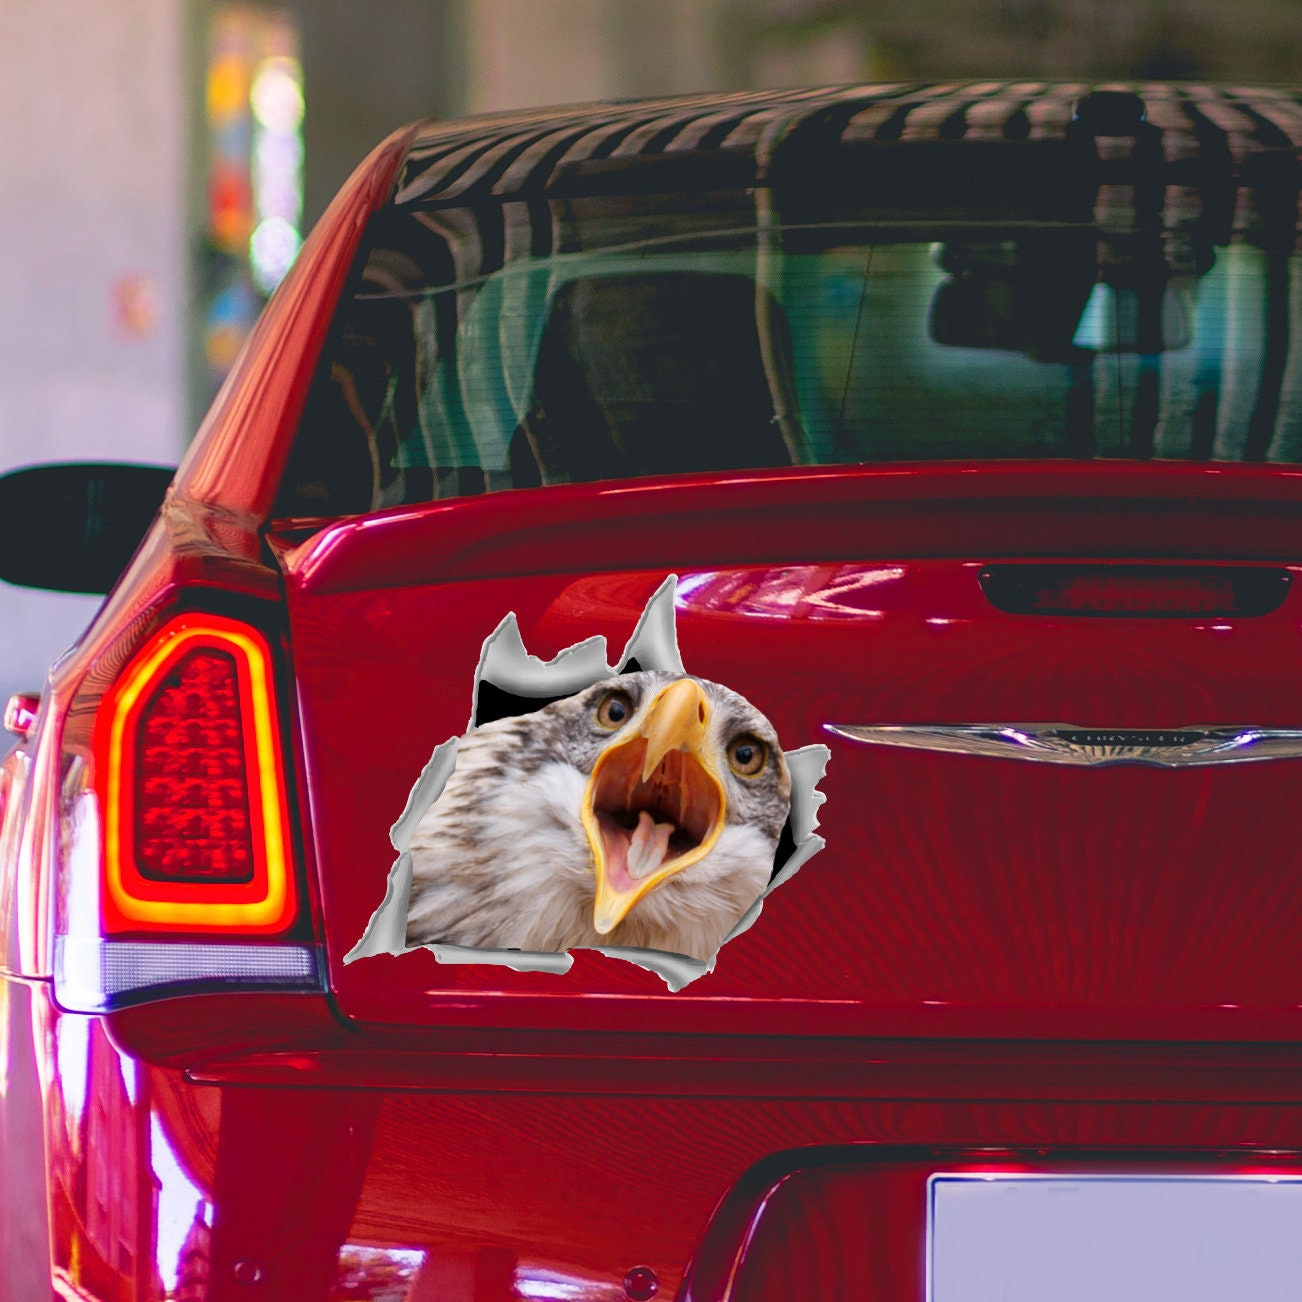 Eagle sticker wild bird decal car bumper sticker car window decal car decals car accessories car vinyl decal pet decal for car o16